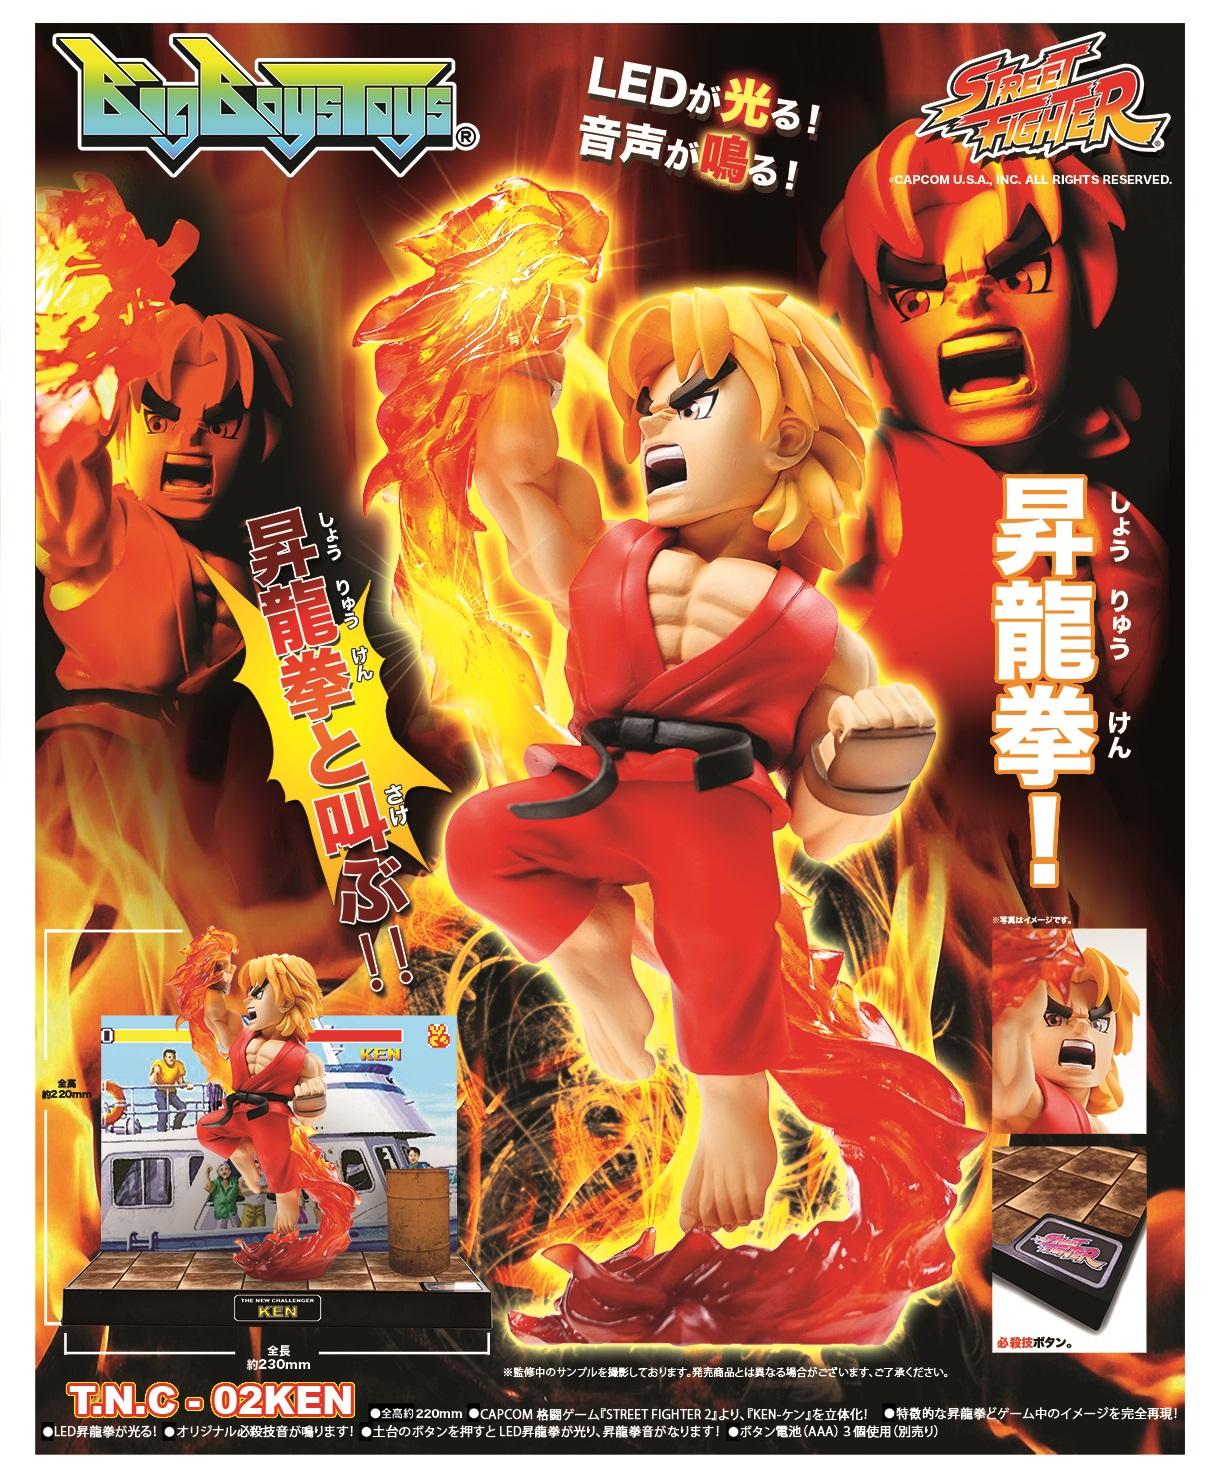 Ken - Street Fighter - BigBoysToys